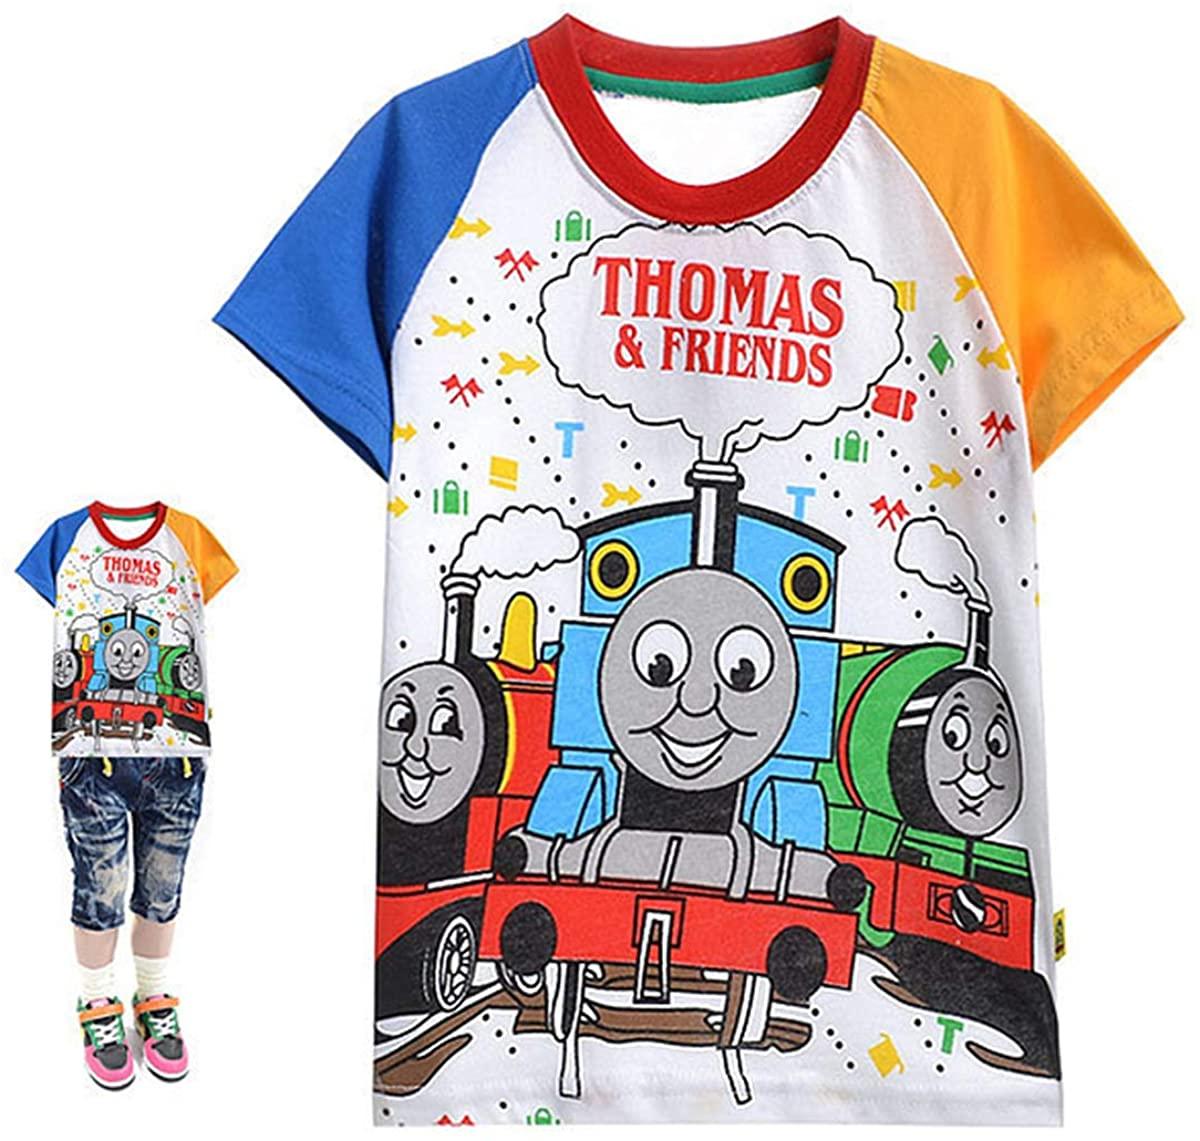 ZooYi Thomas The Tank Engine&Friends T-Shirts-Toddler Kids Short Sleeve Shirts Cartoon Print Tops Tee